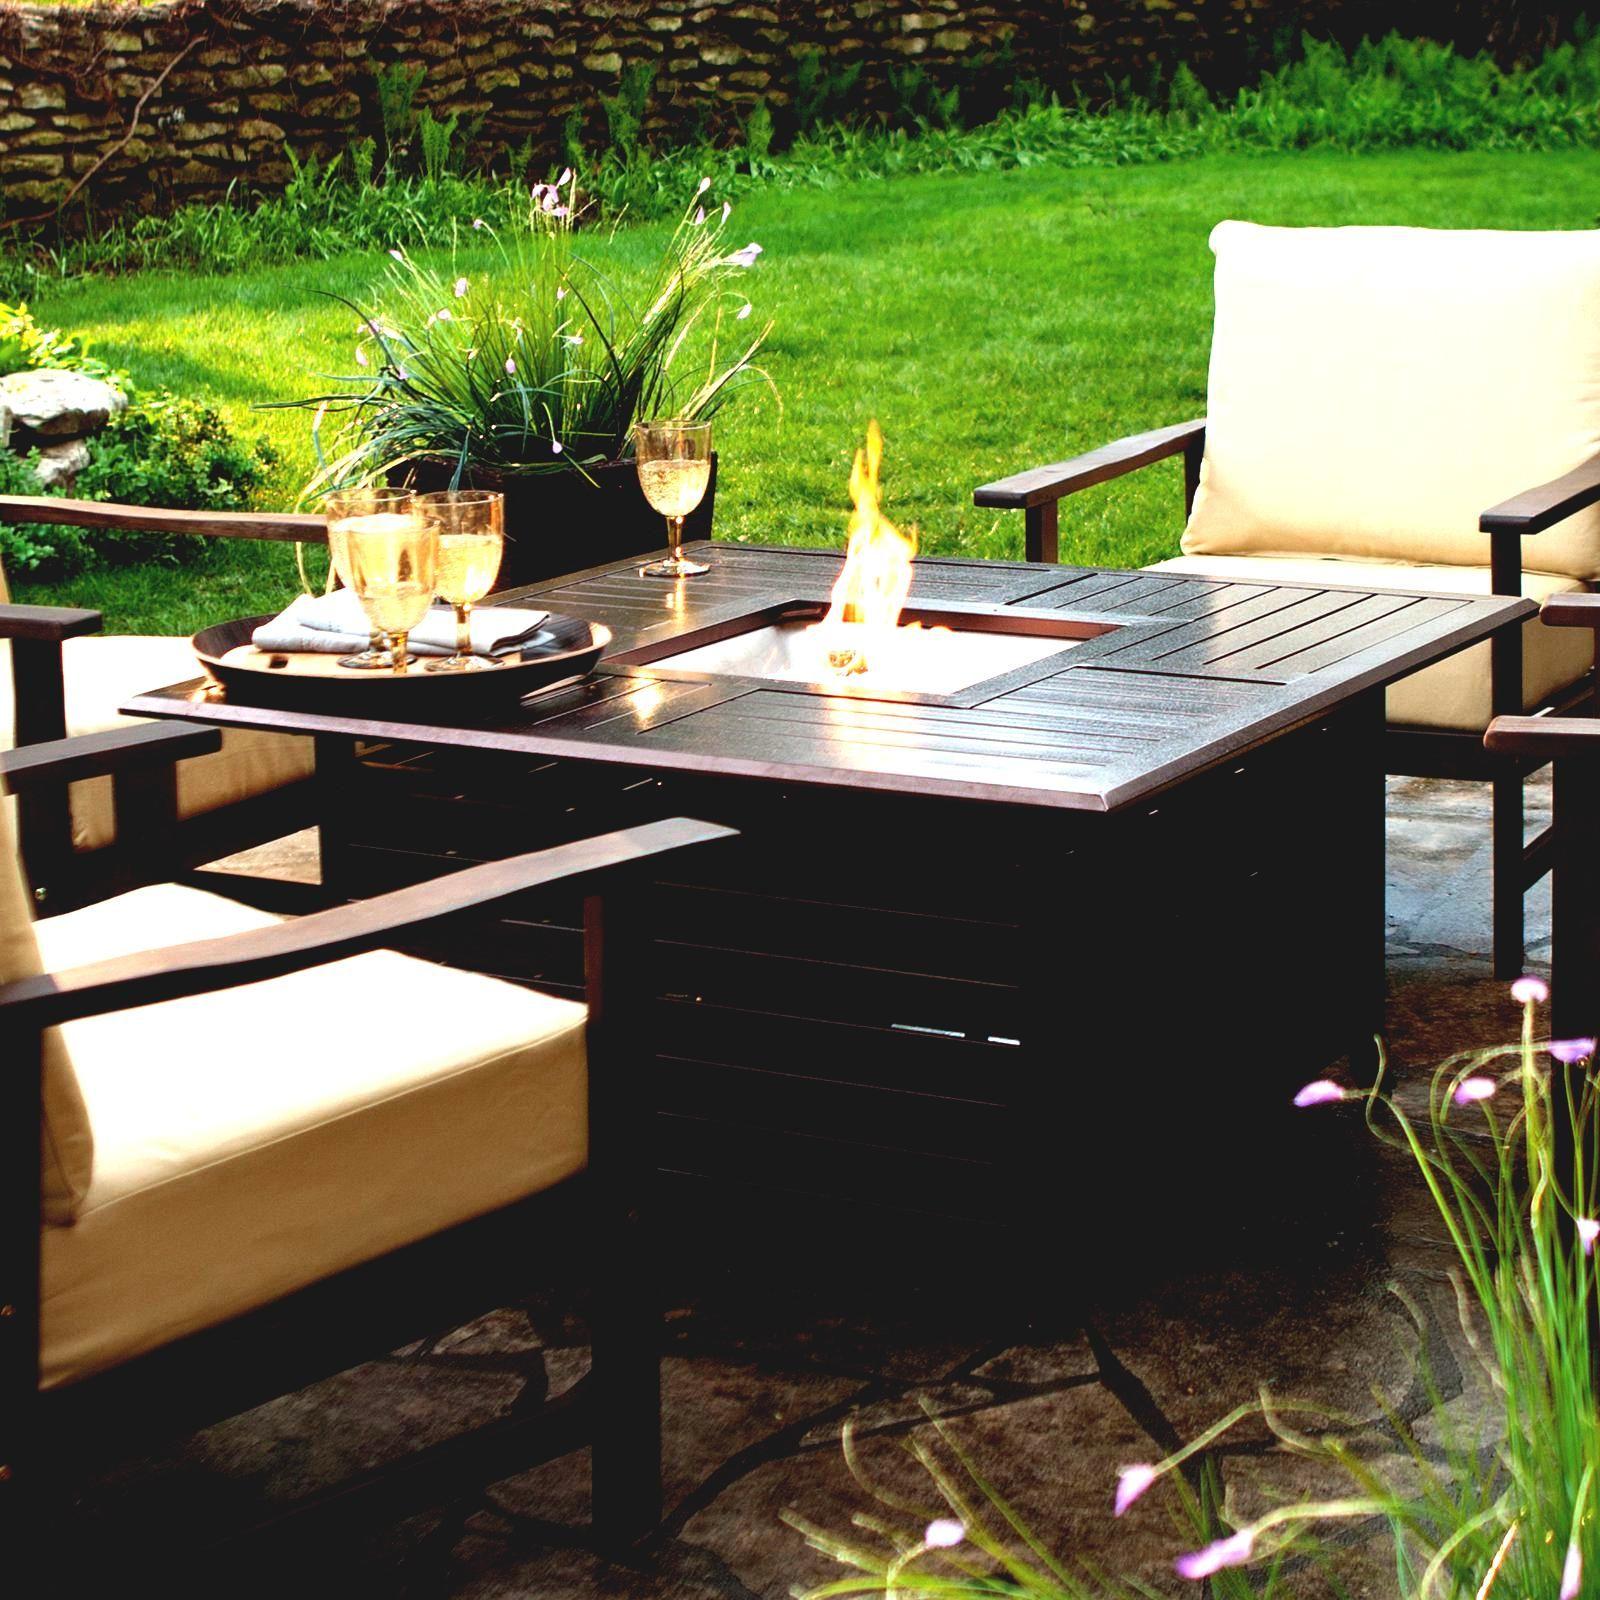 Toskanische Fliesen Mission Stil Outdoor Feuerstelle Gartendeko Propane Fire Pit Table Fire Pit Table Fire Pit Furniture